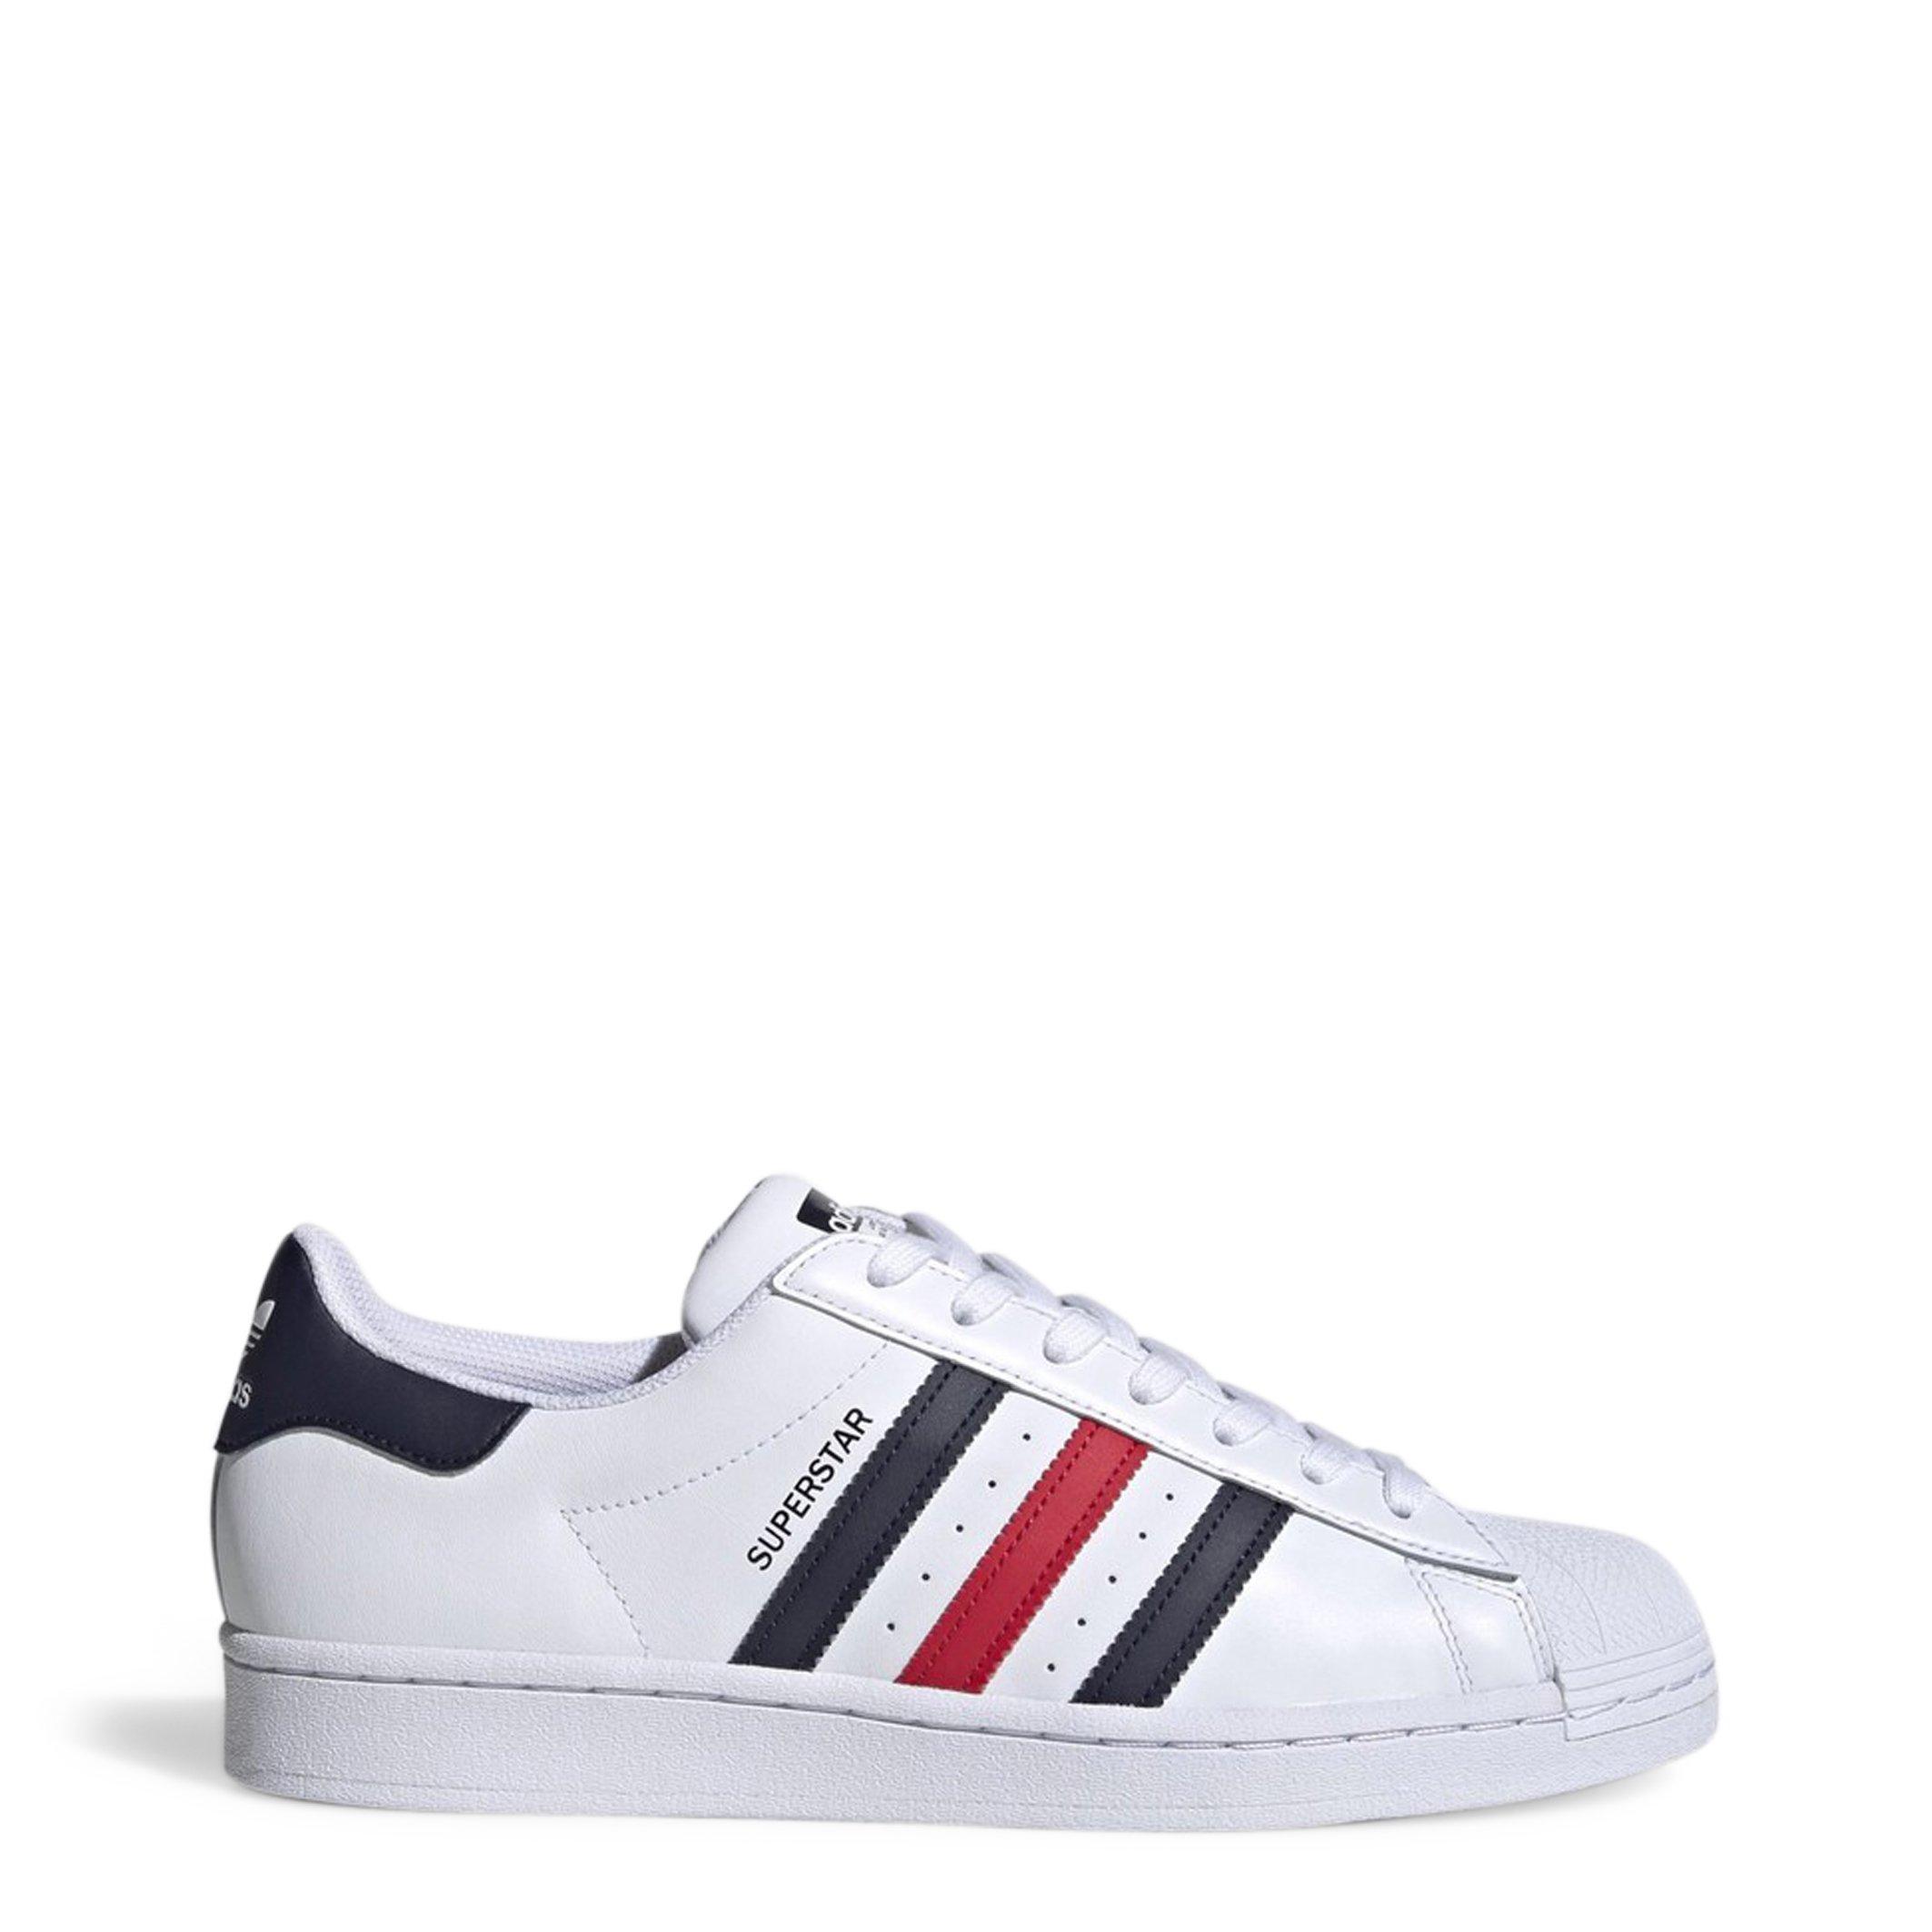 Adidas Women's Trainer Various Colours Superstar - white-4 UK 5.0